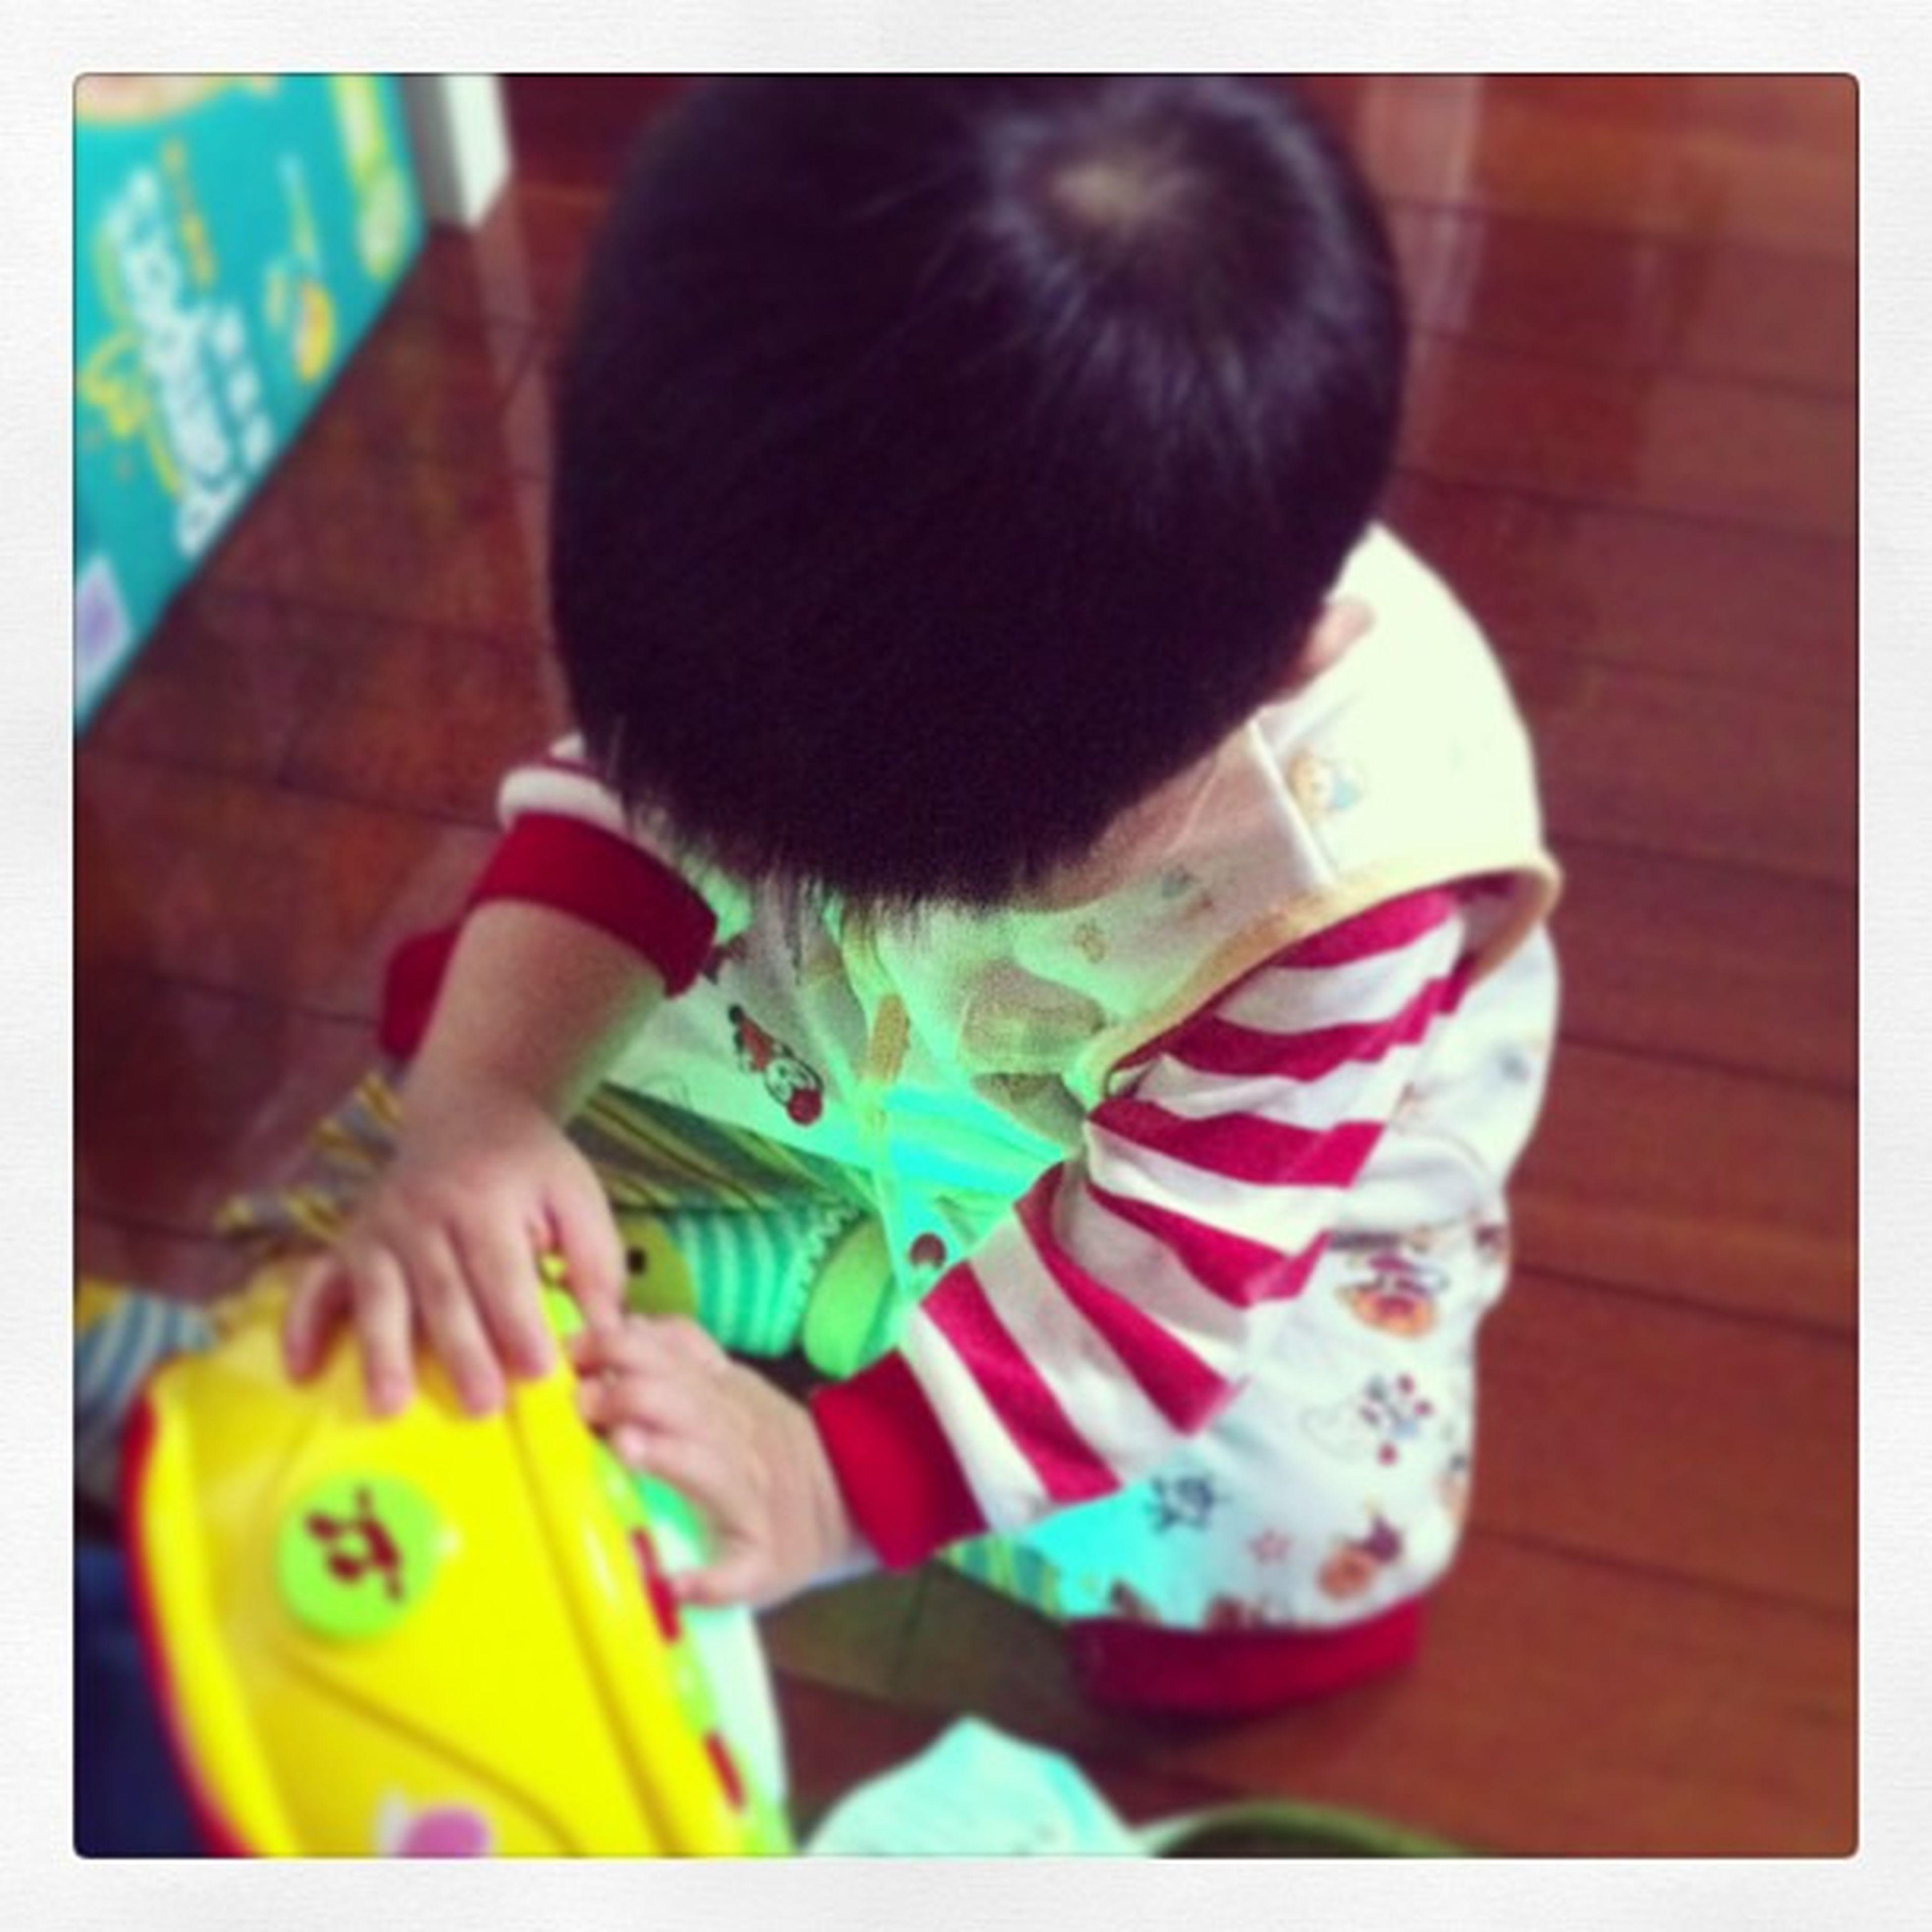 2013~05~08 Baby Rain House Pempers love BB home familyday drum